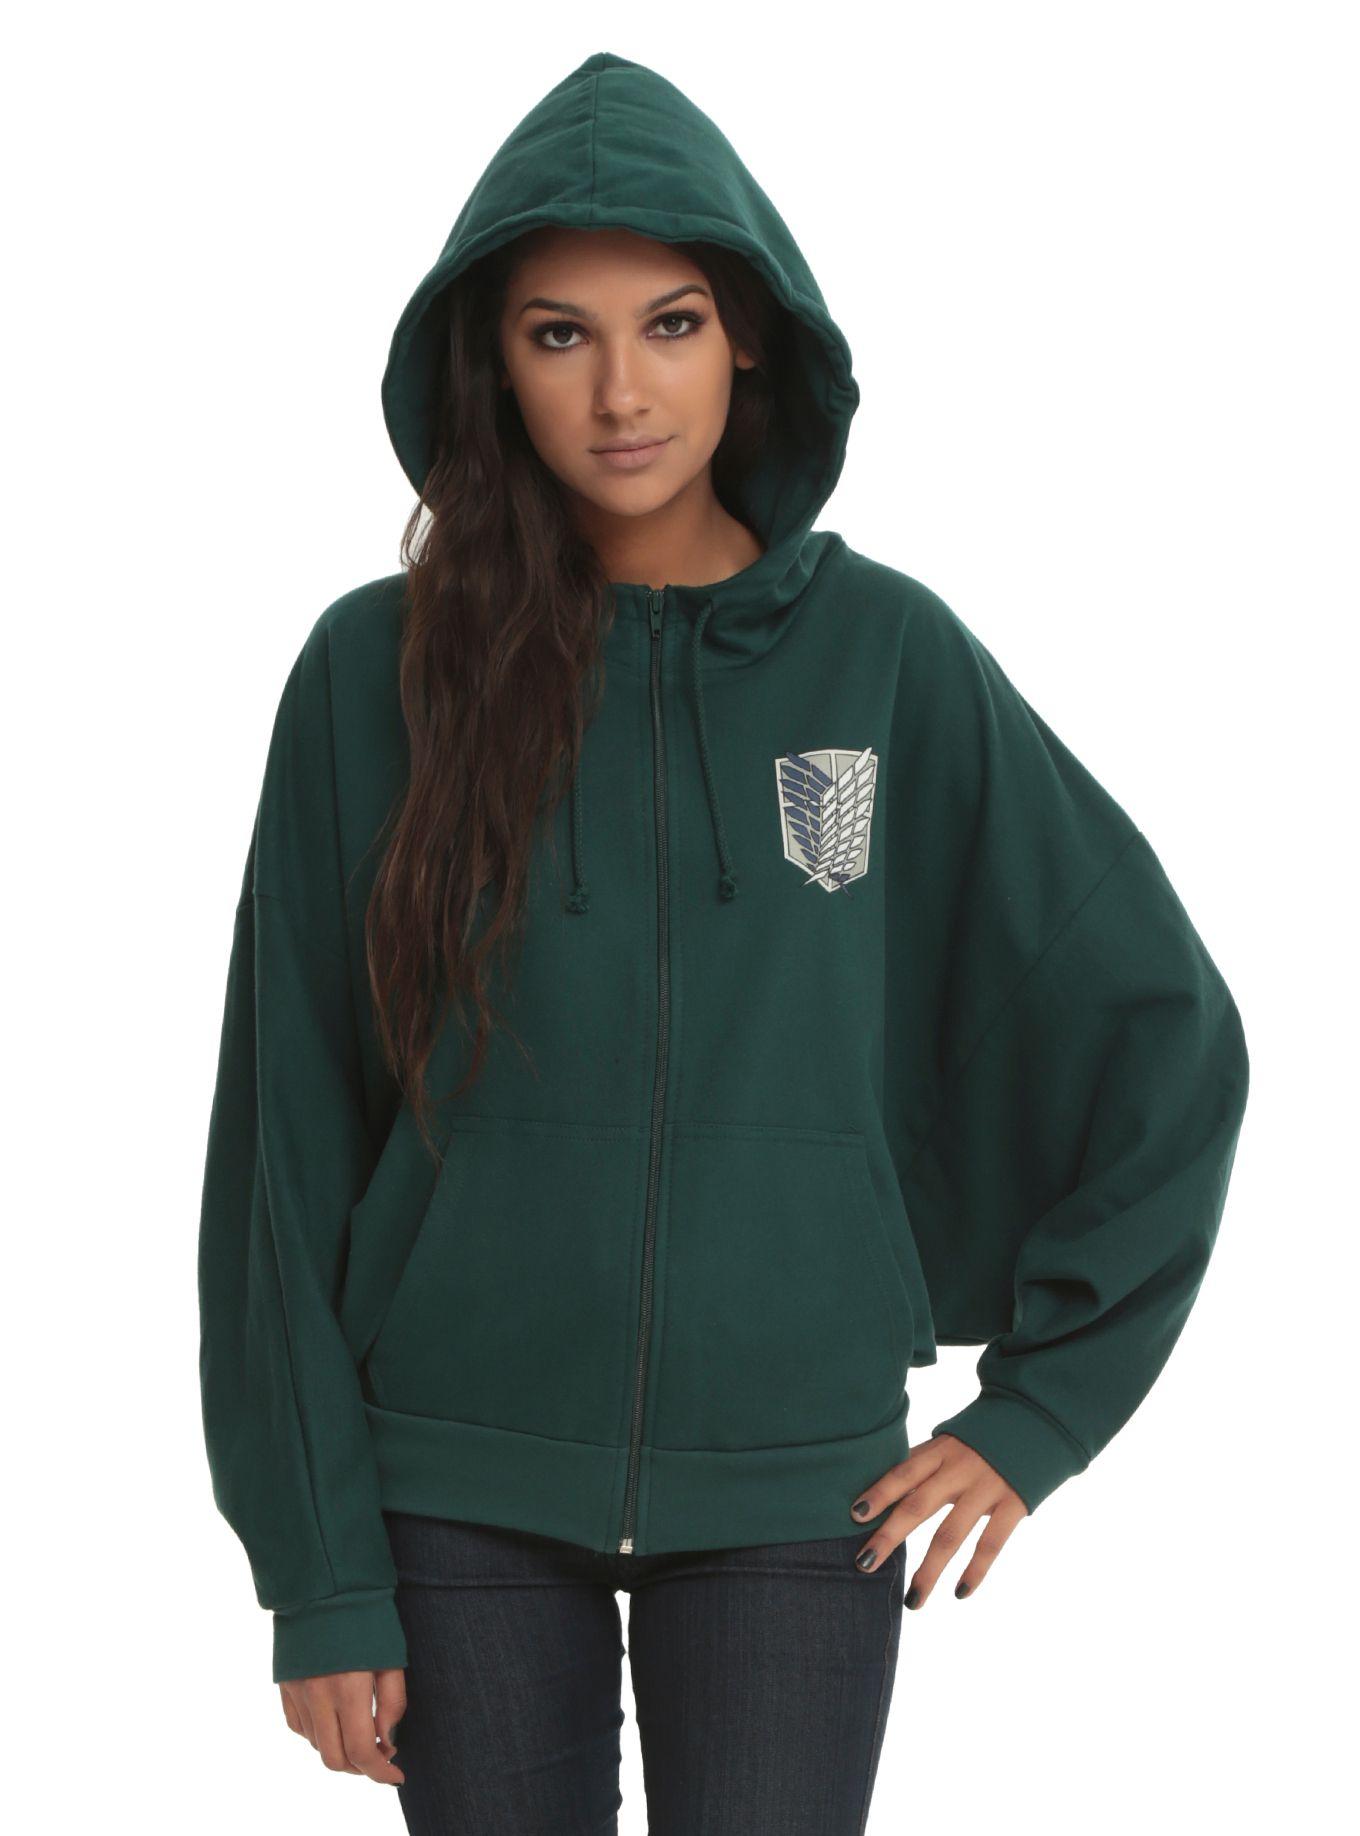 Girls hoodies sweatshirts pullovers zip hoodies hot